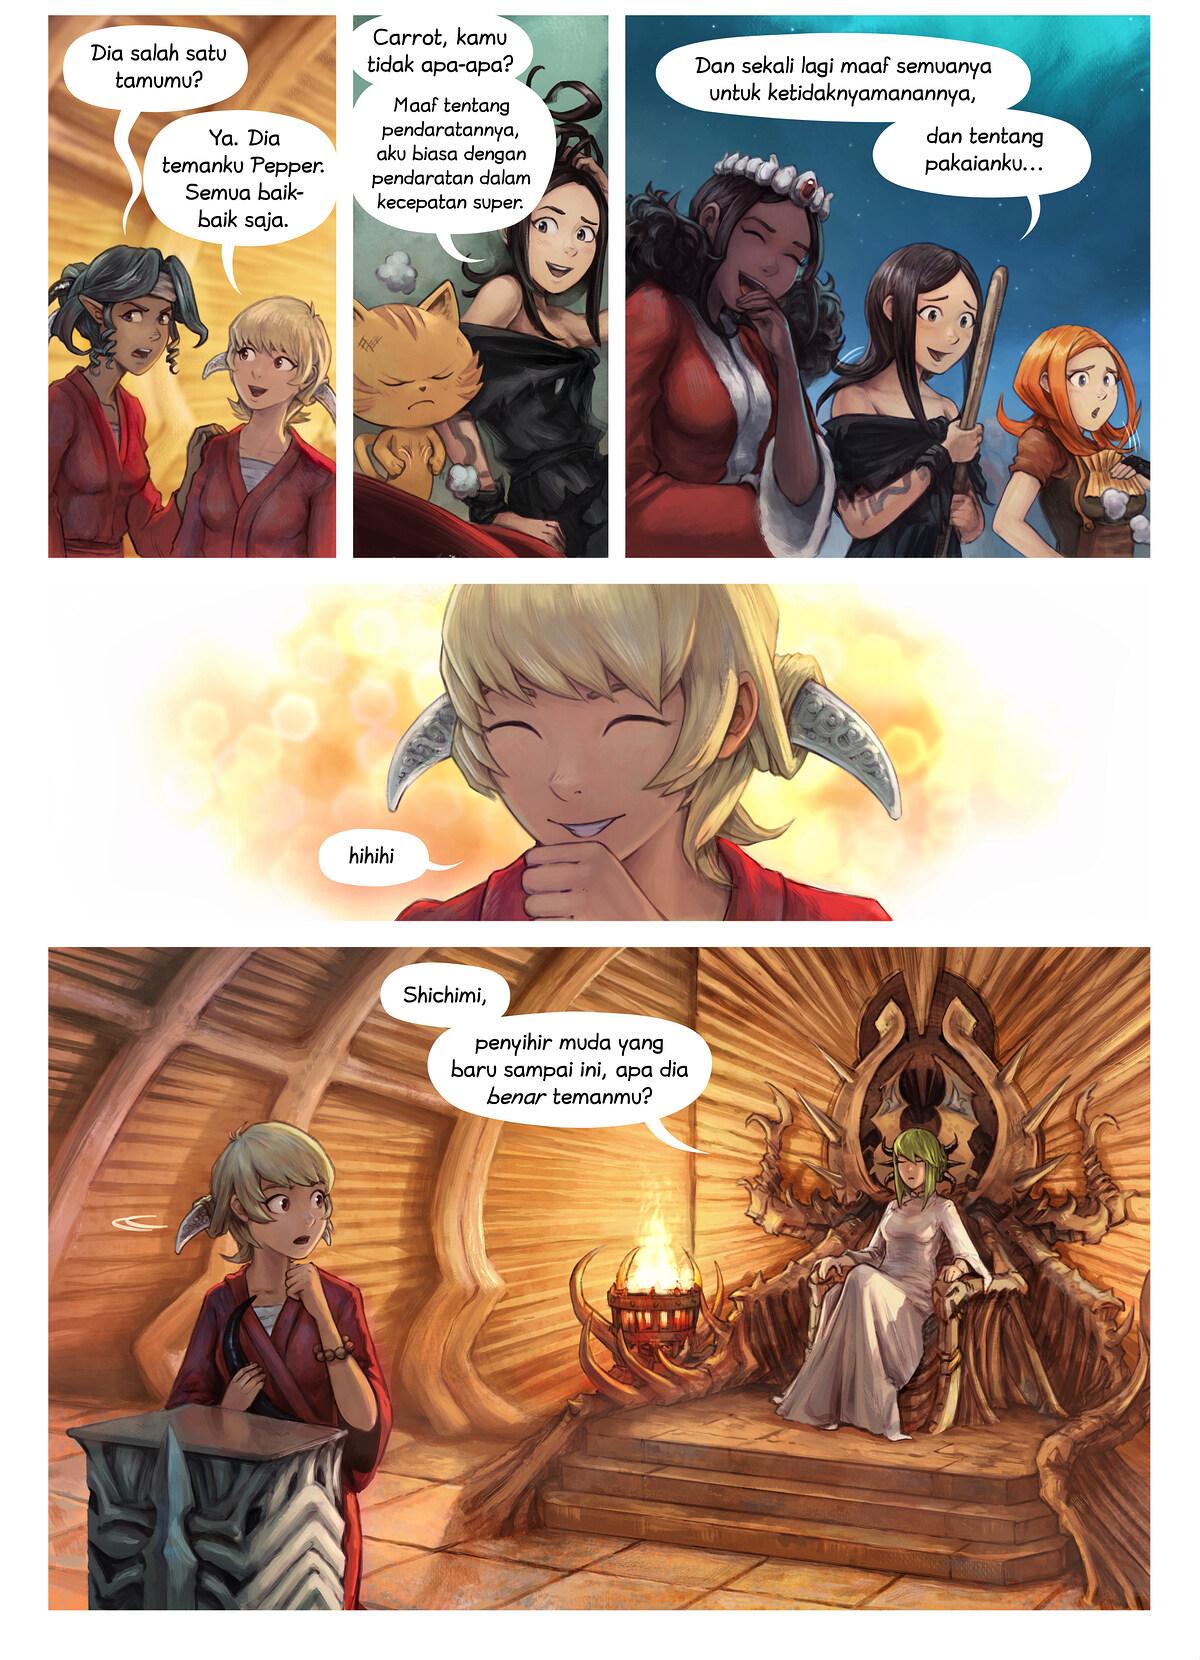 Episode 34: Pemberian Gelar Ksatria Shichimi, Page 3